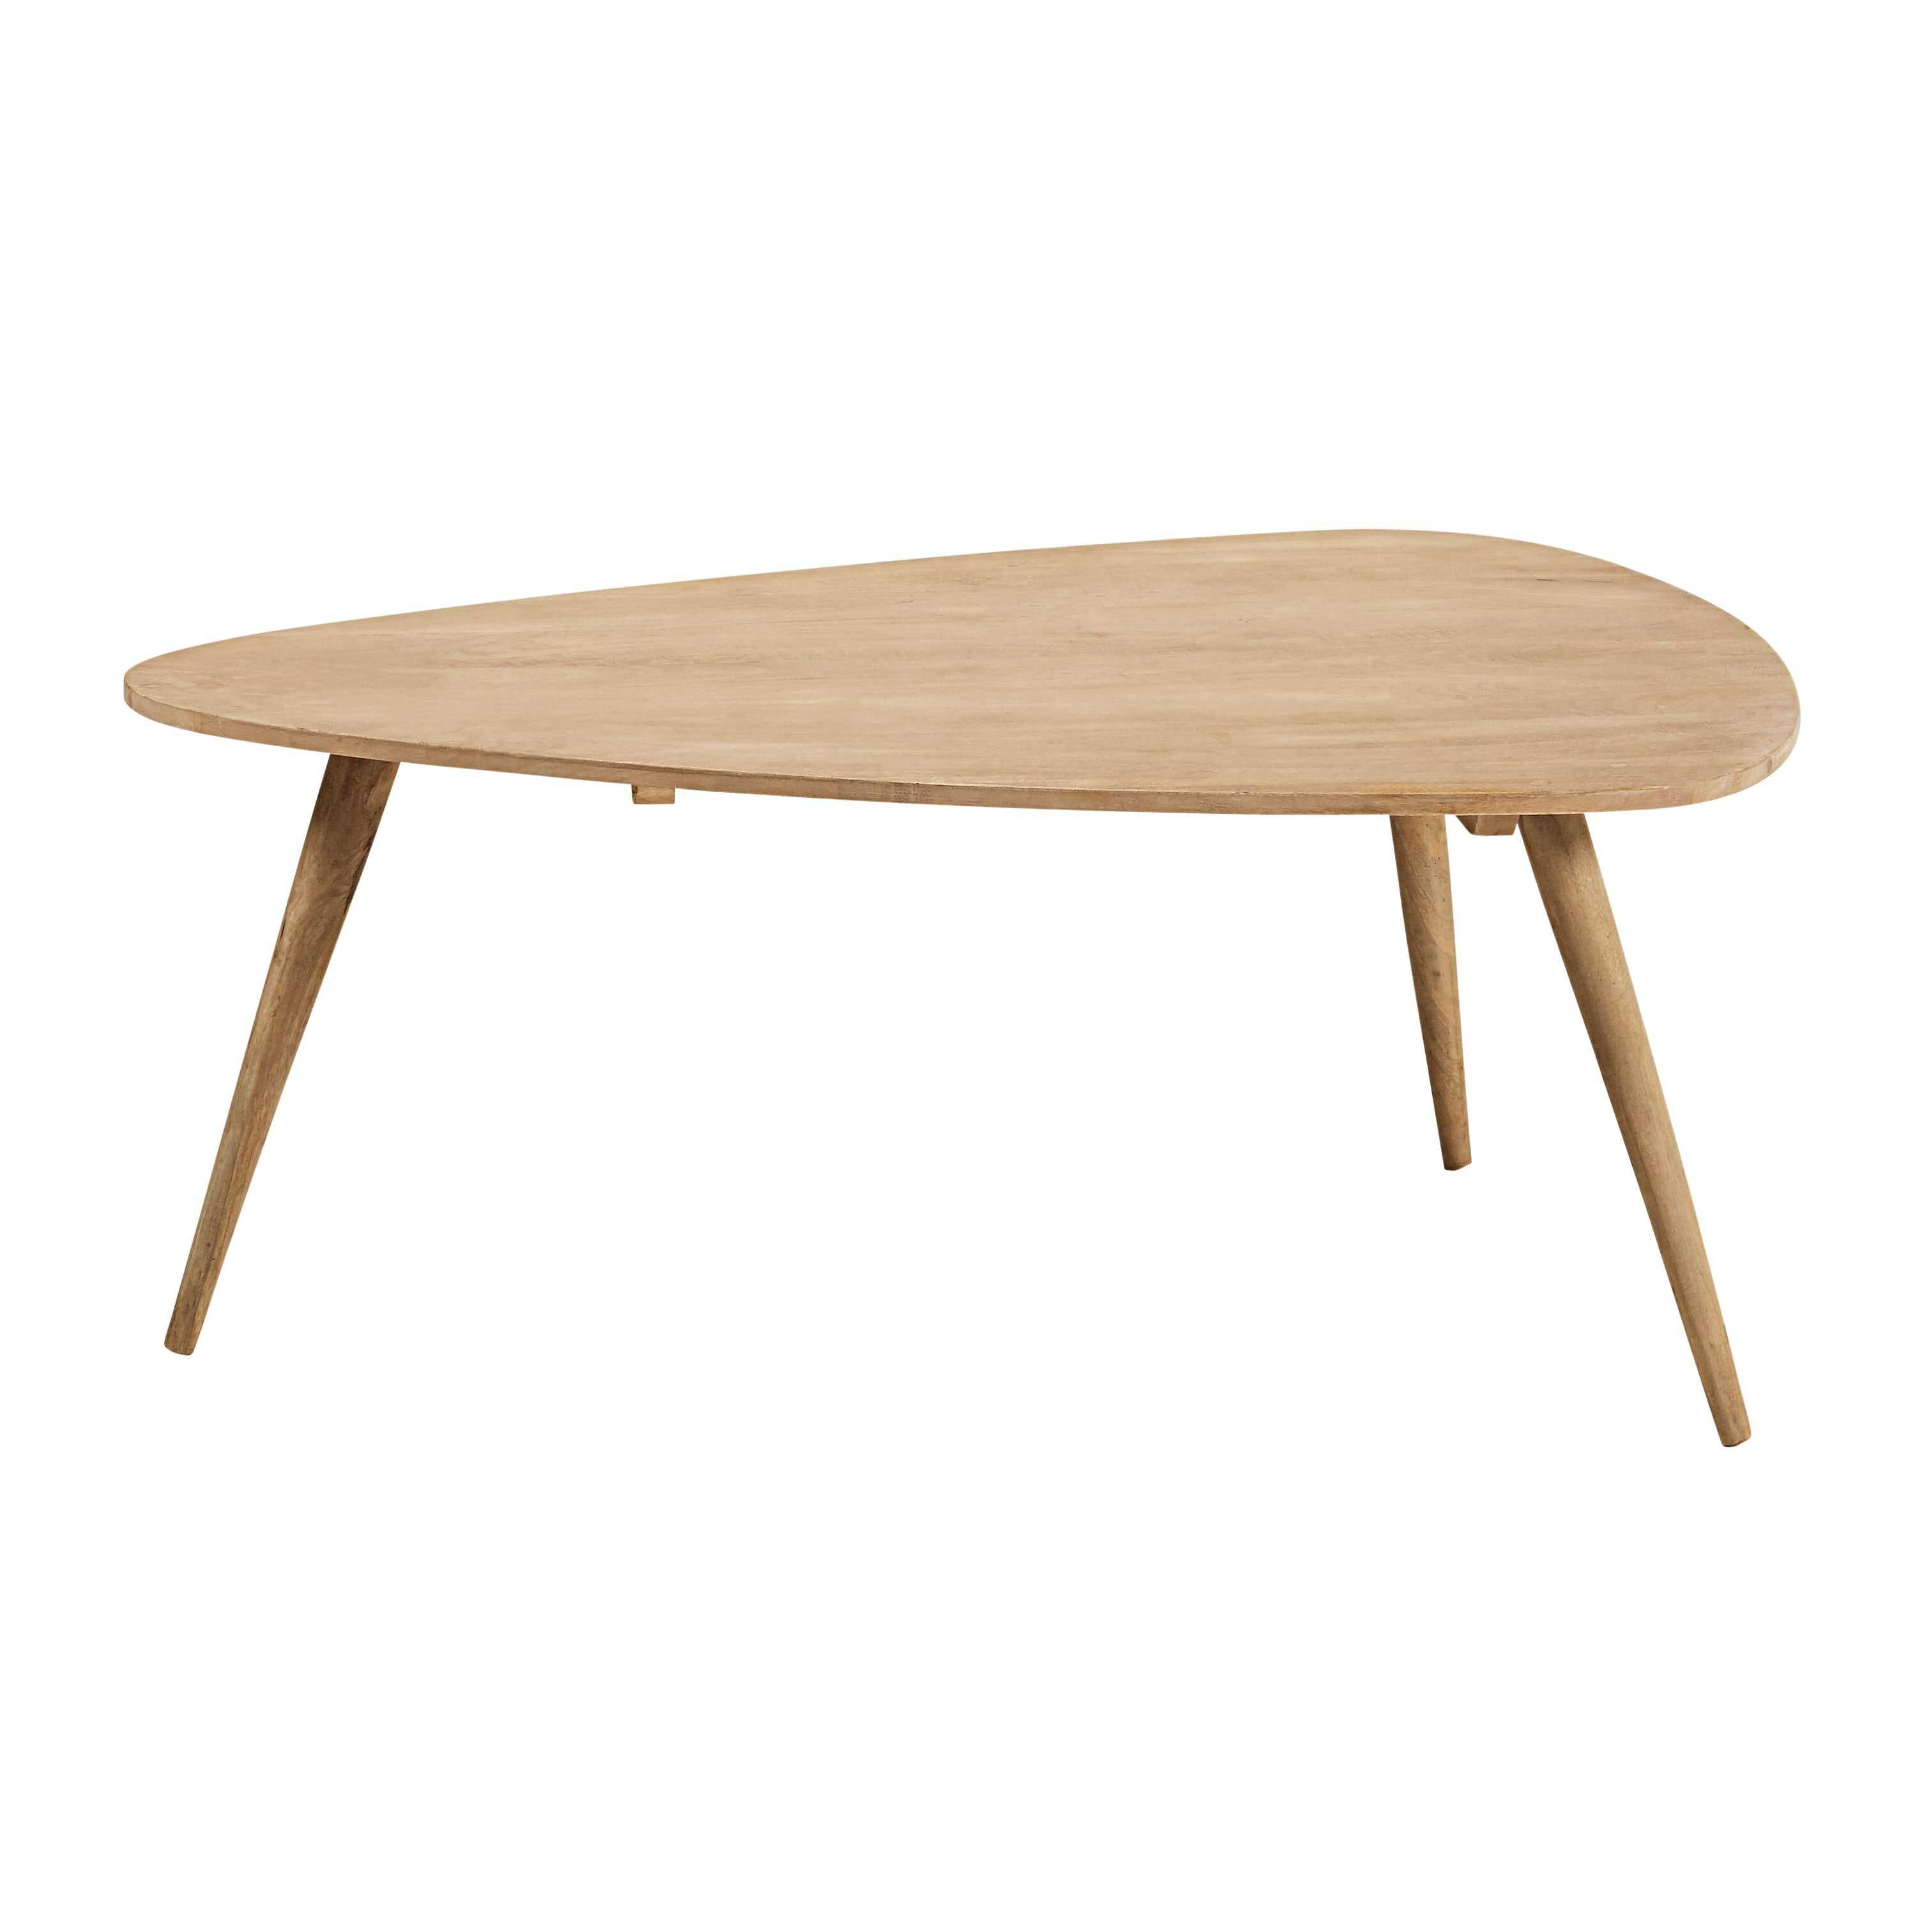 Table basse vintage en manguier massif 120x85 - Table basse en manguier ...